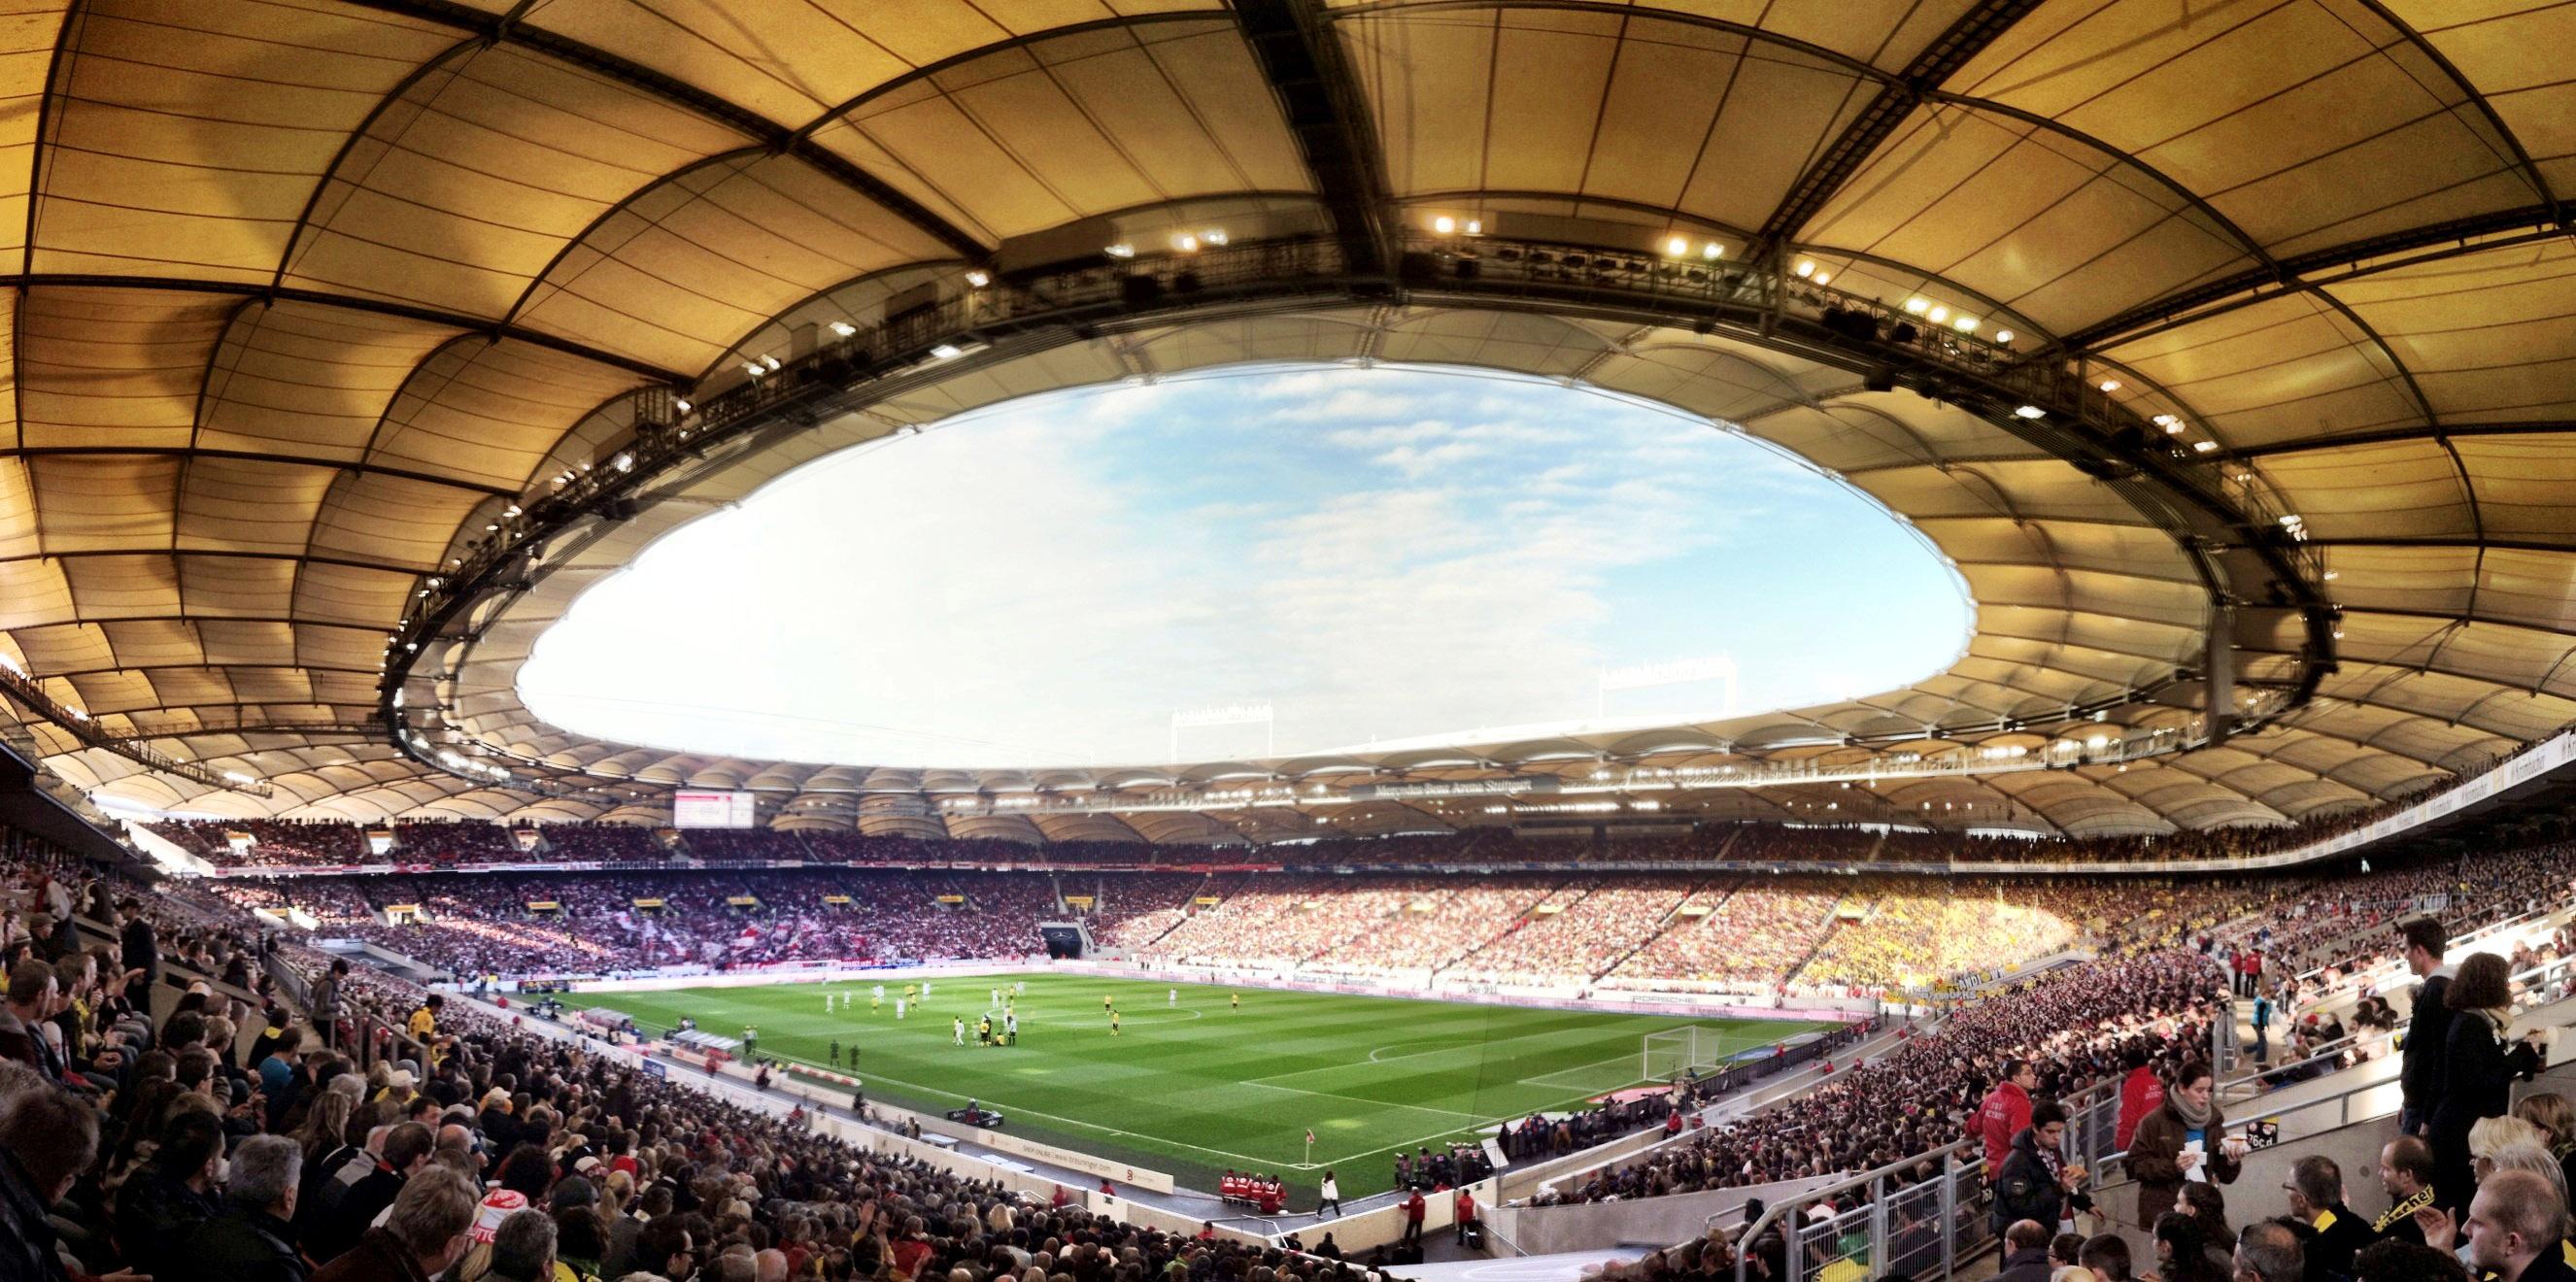 Sitzplatzkarten VfB-Düsseldorf/Sandhausen/Kaiserslautern/Bochum: Block 2c